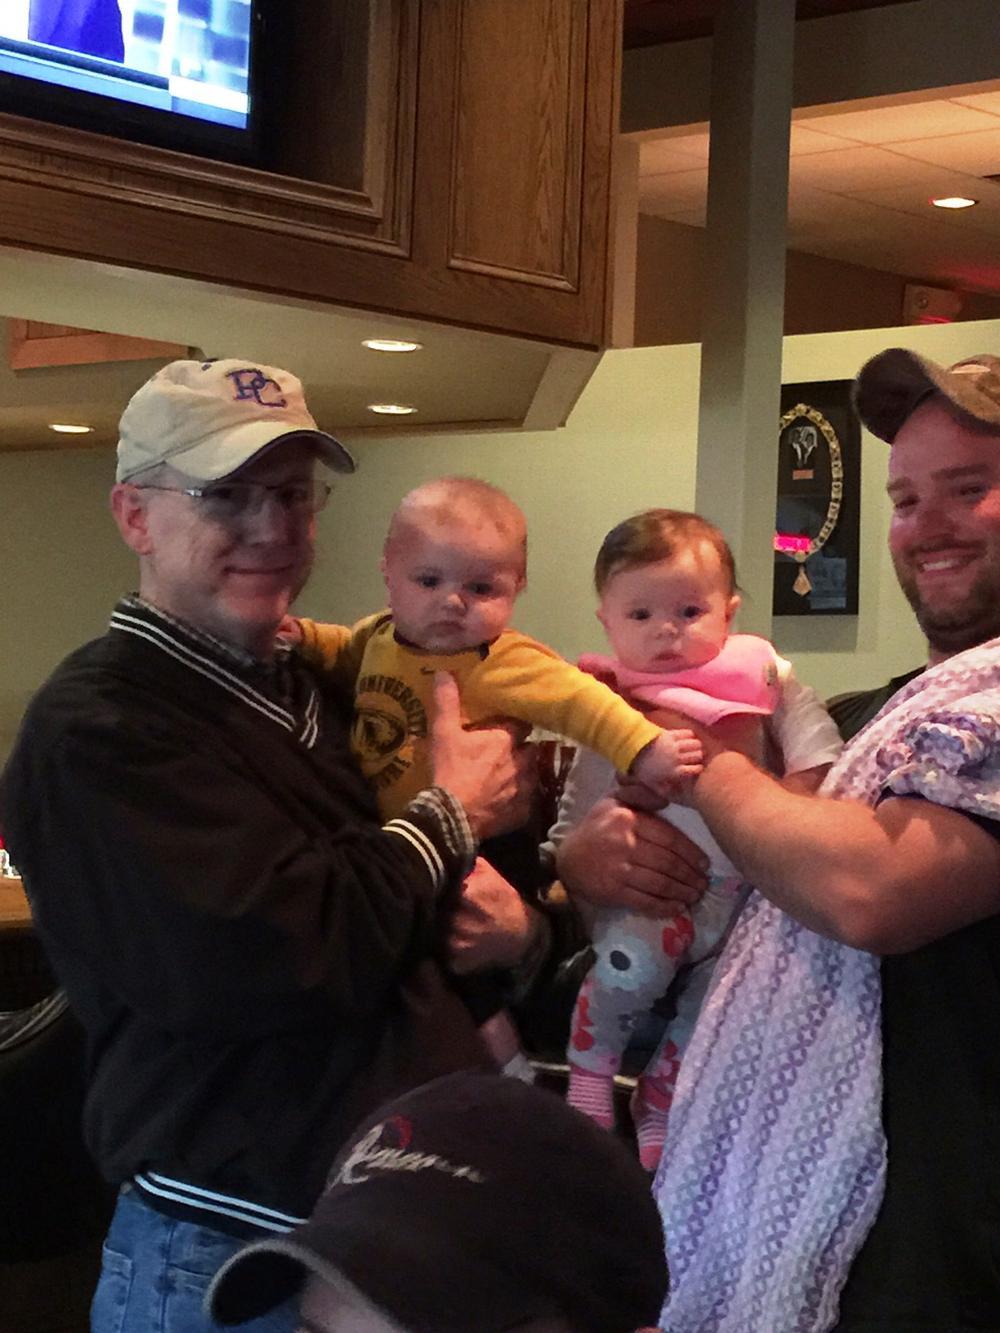 Elks Babies at the Lodge.  ER Steven Harvey with Jackson Stone, Avery Mae Lehman (ER Harvey's Grand Daughter) & Lary Lehman